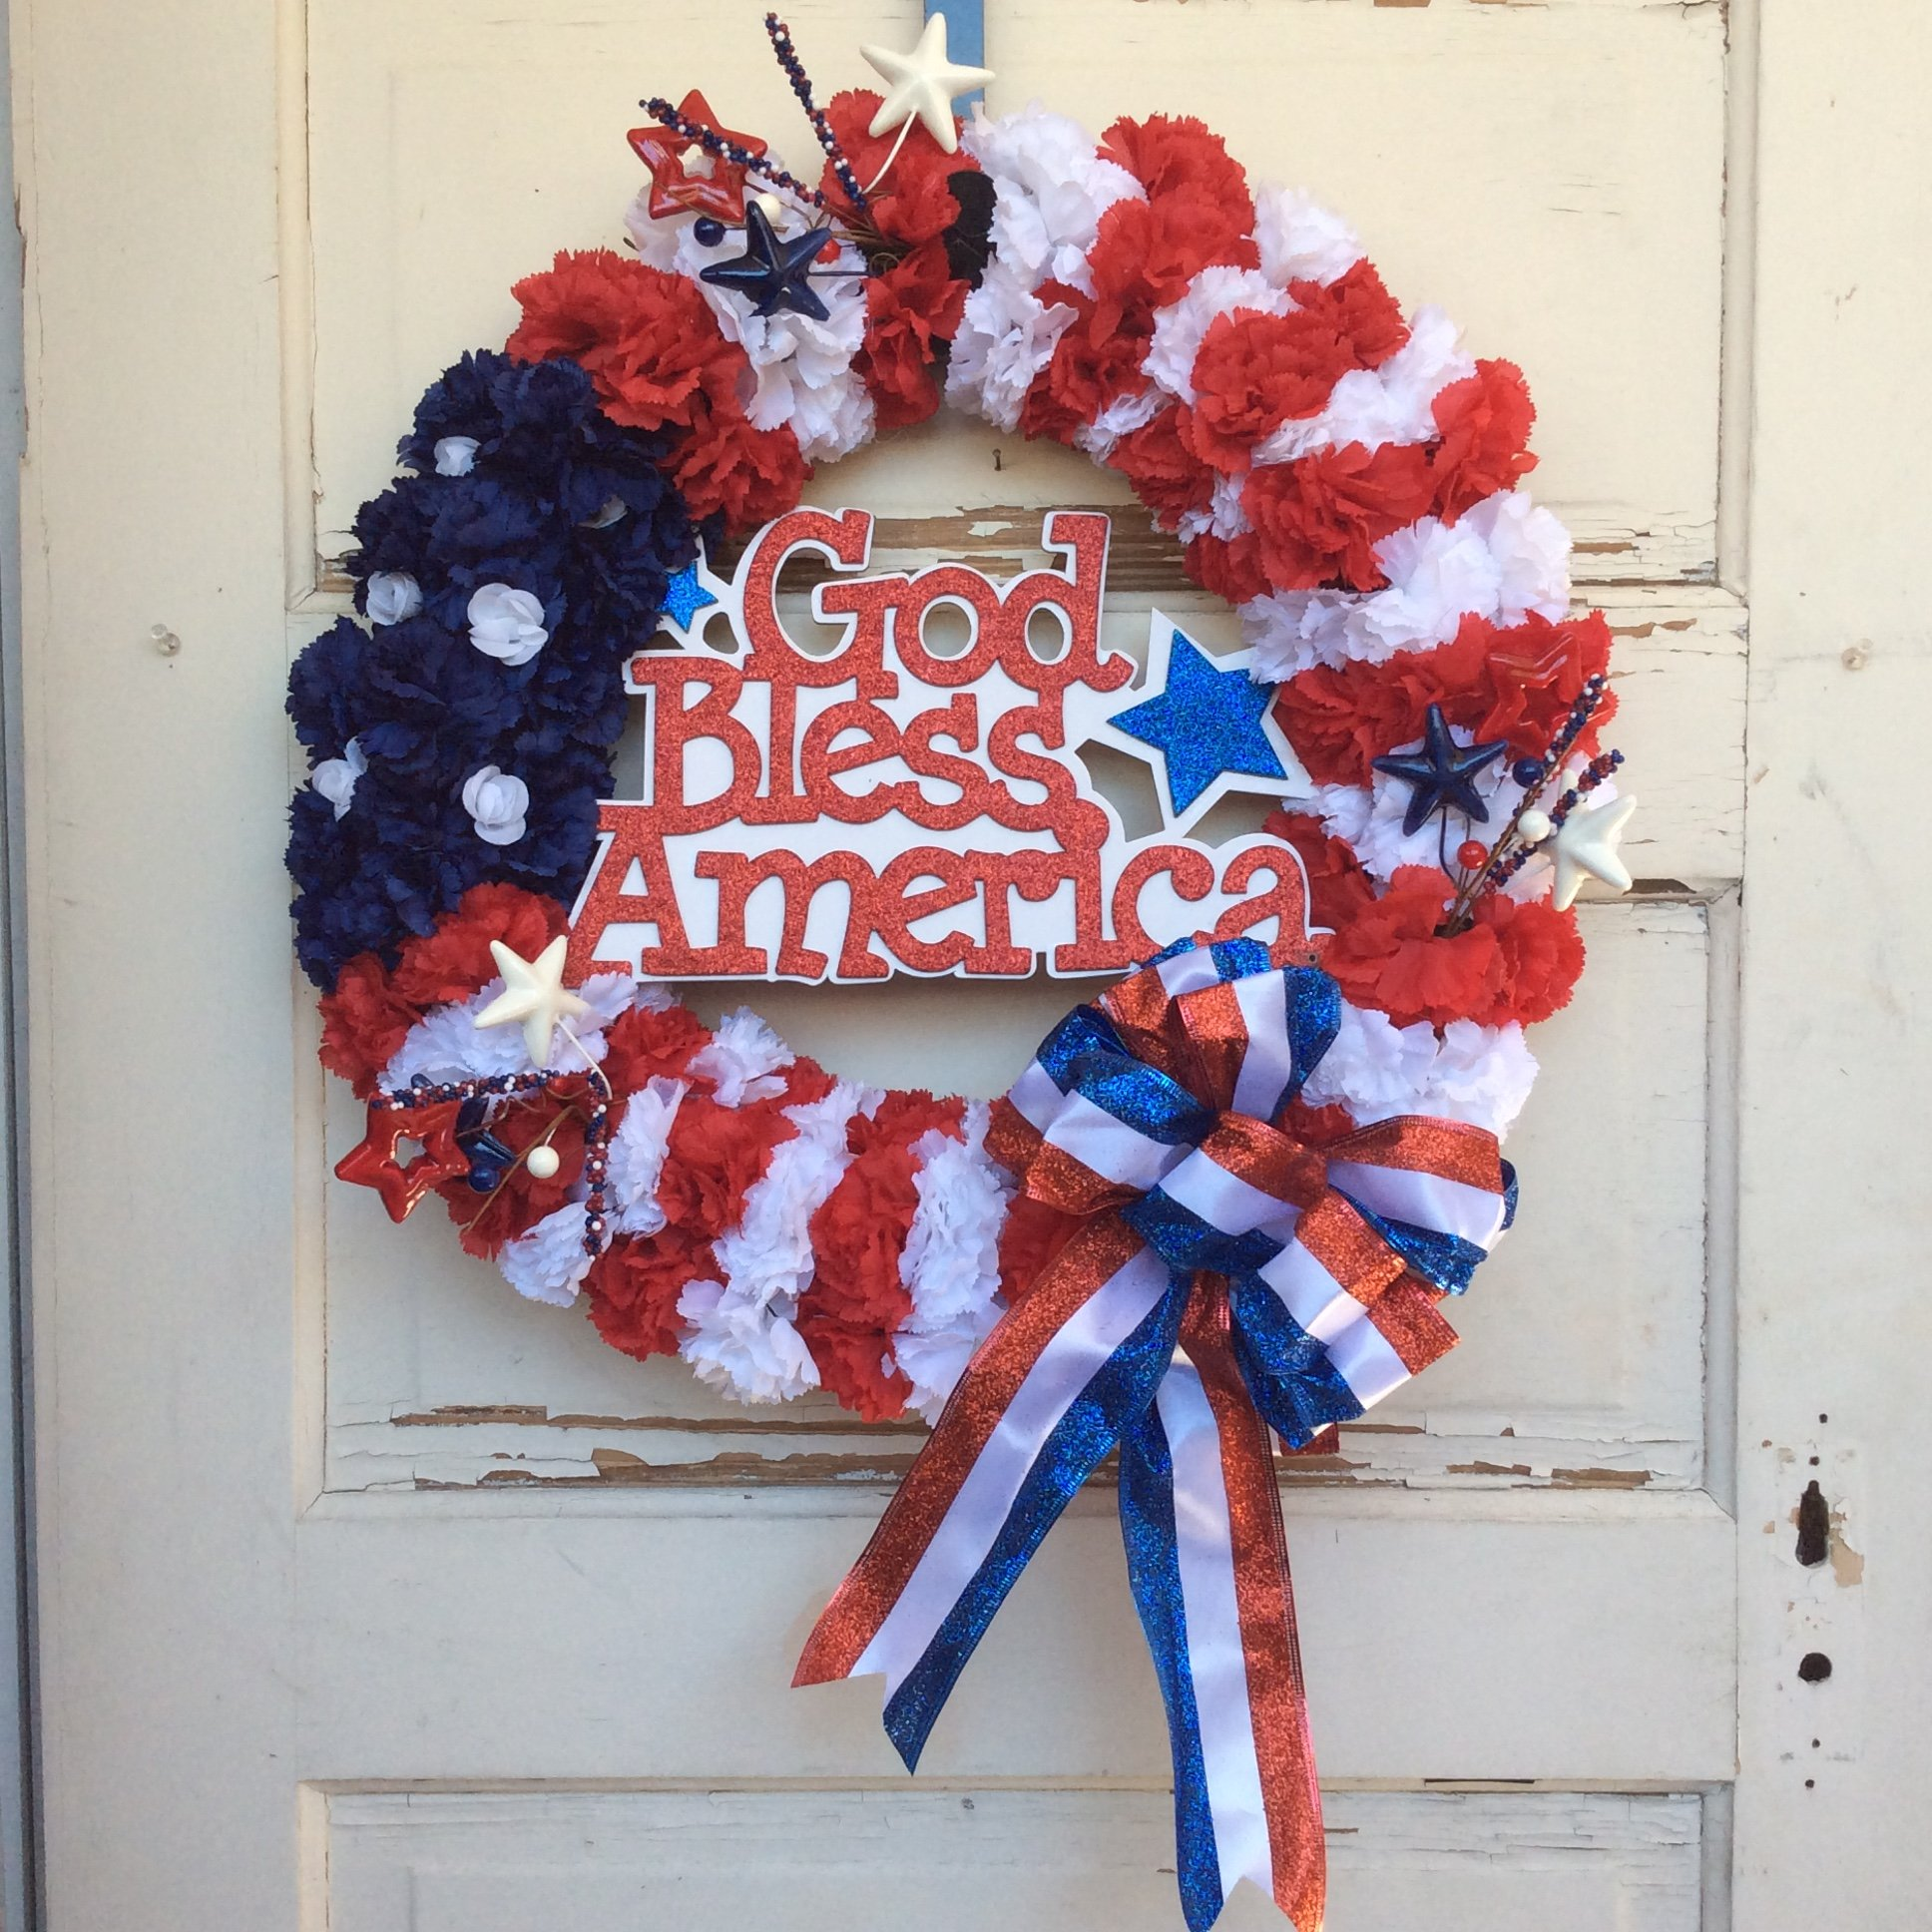 AG Designs Patriotic Decor – God Bless America Carnation Wreath